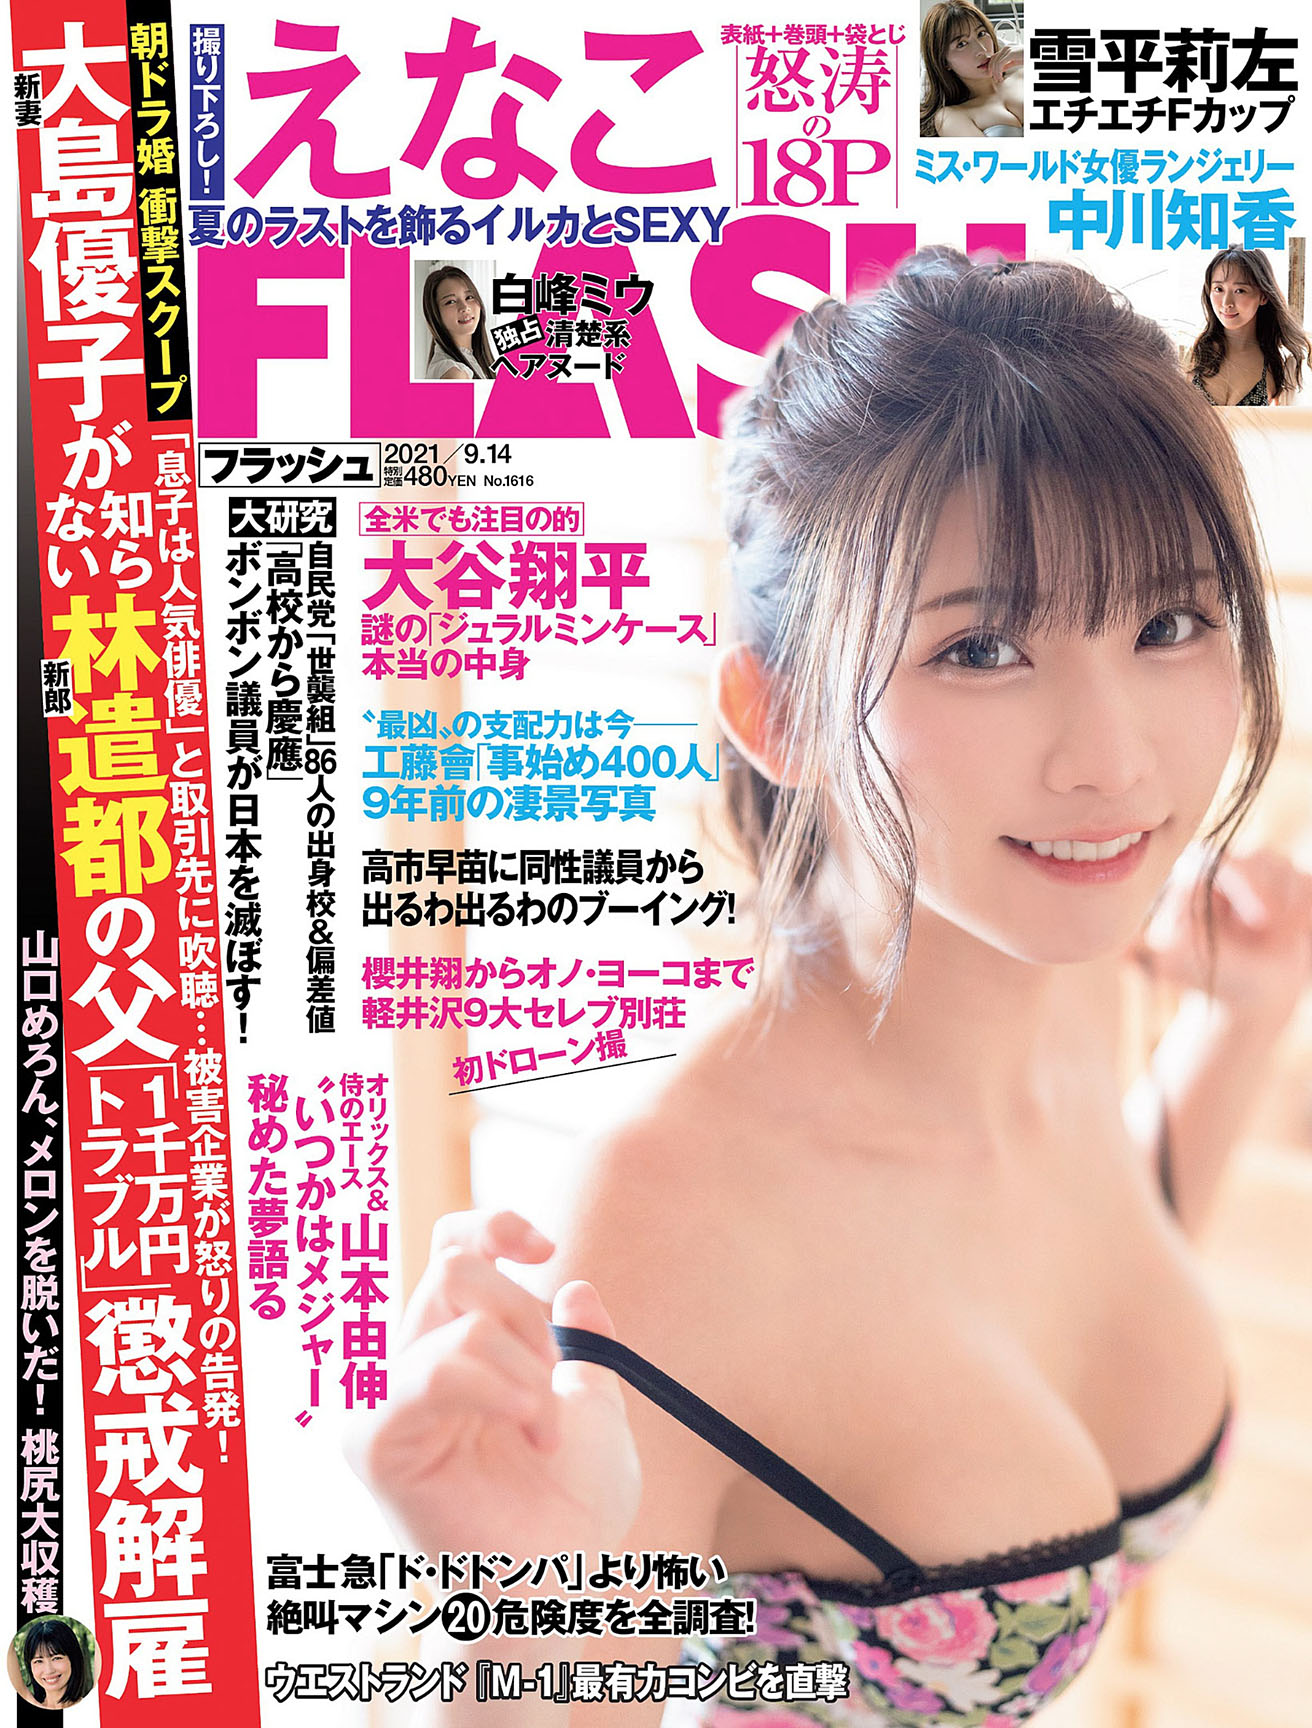 Enako Flash 210914 01.jpg